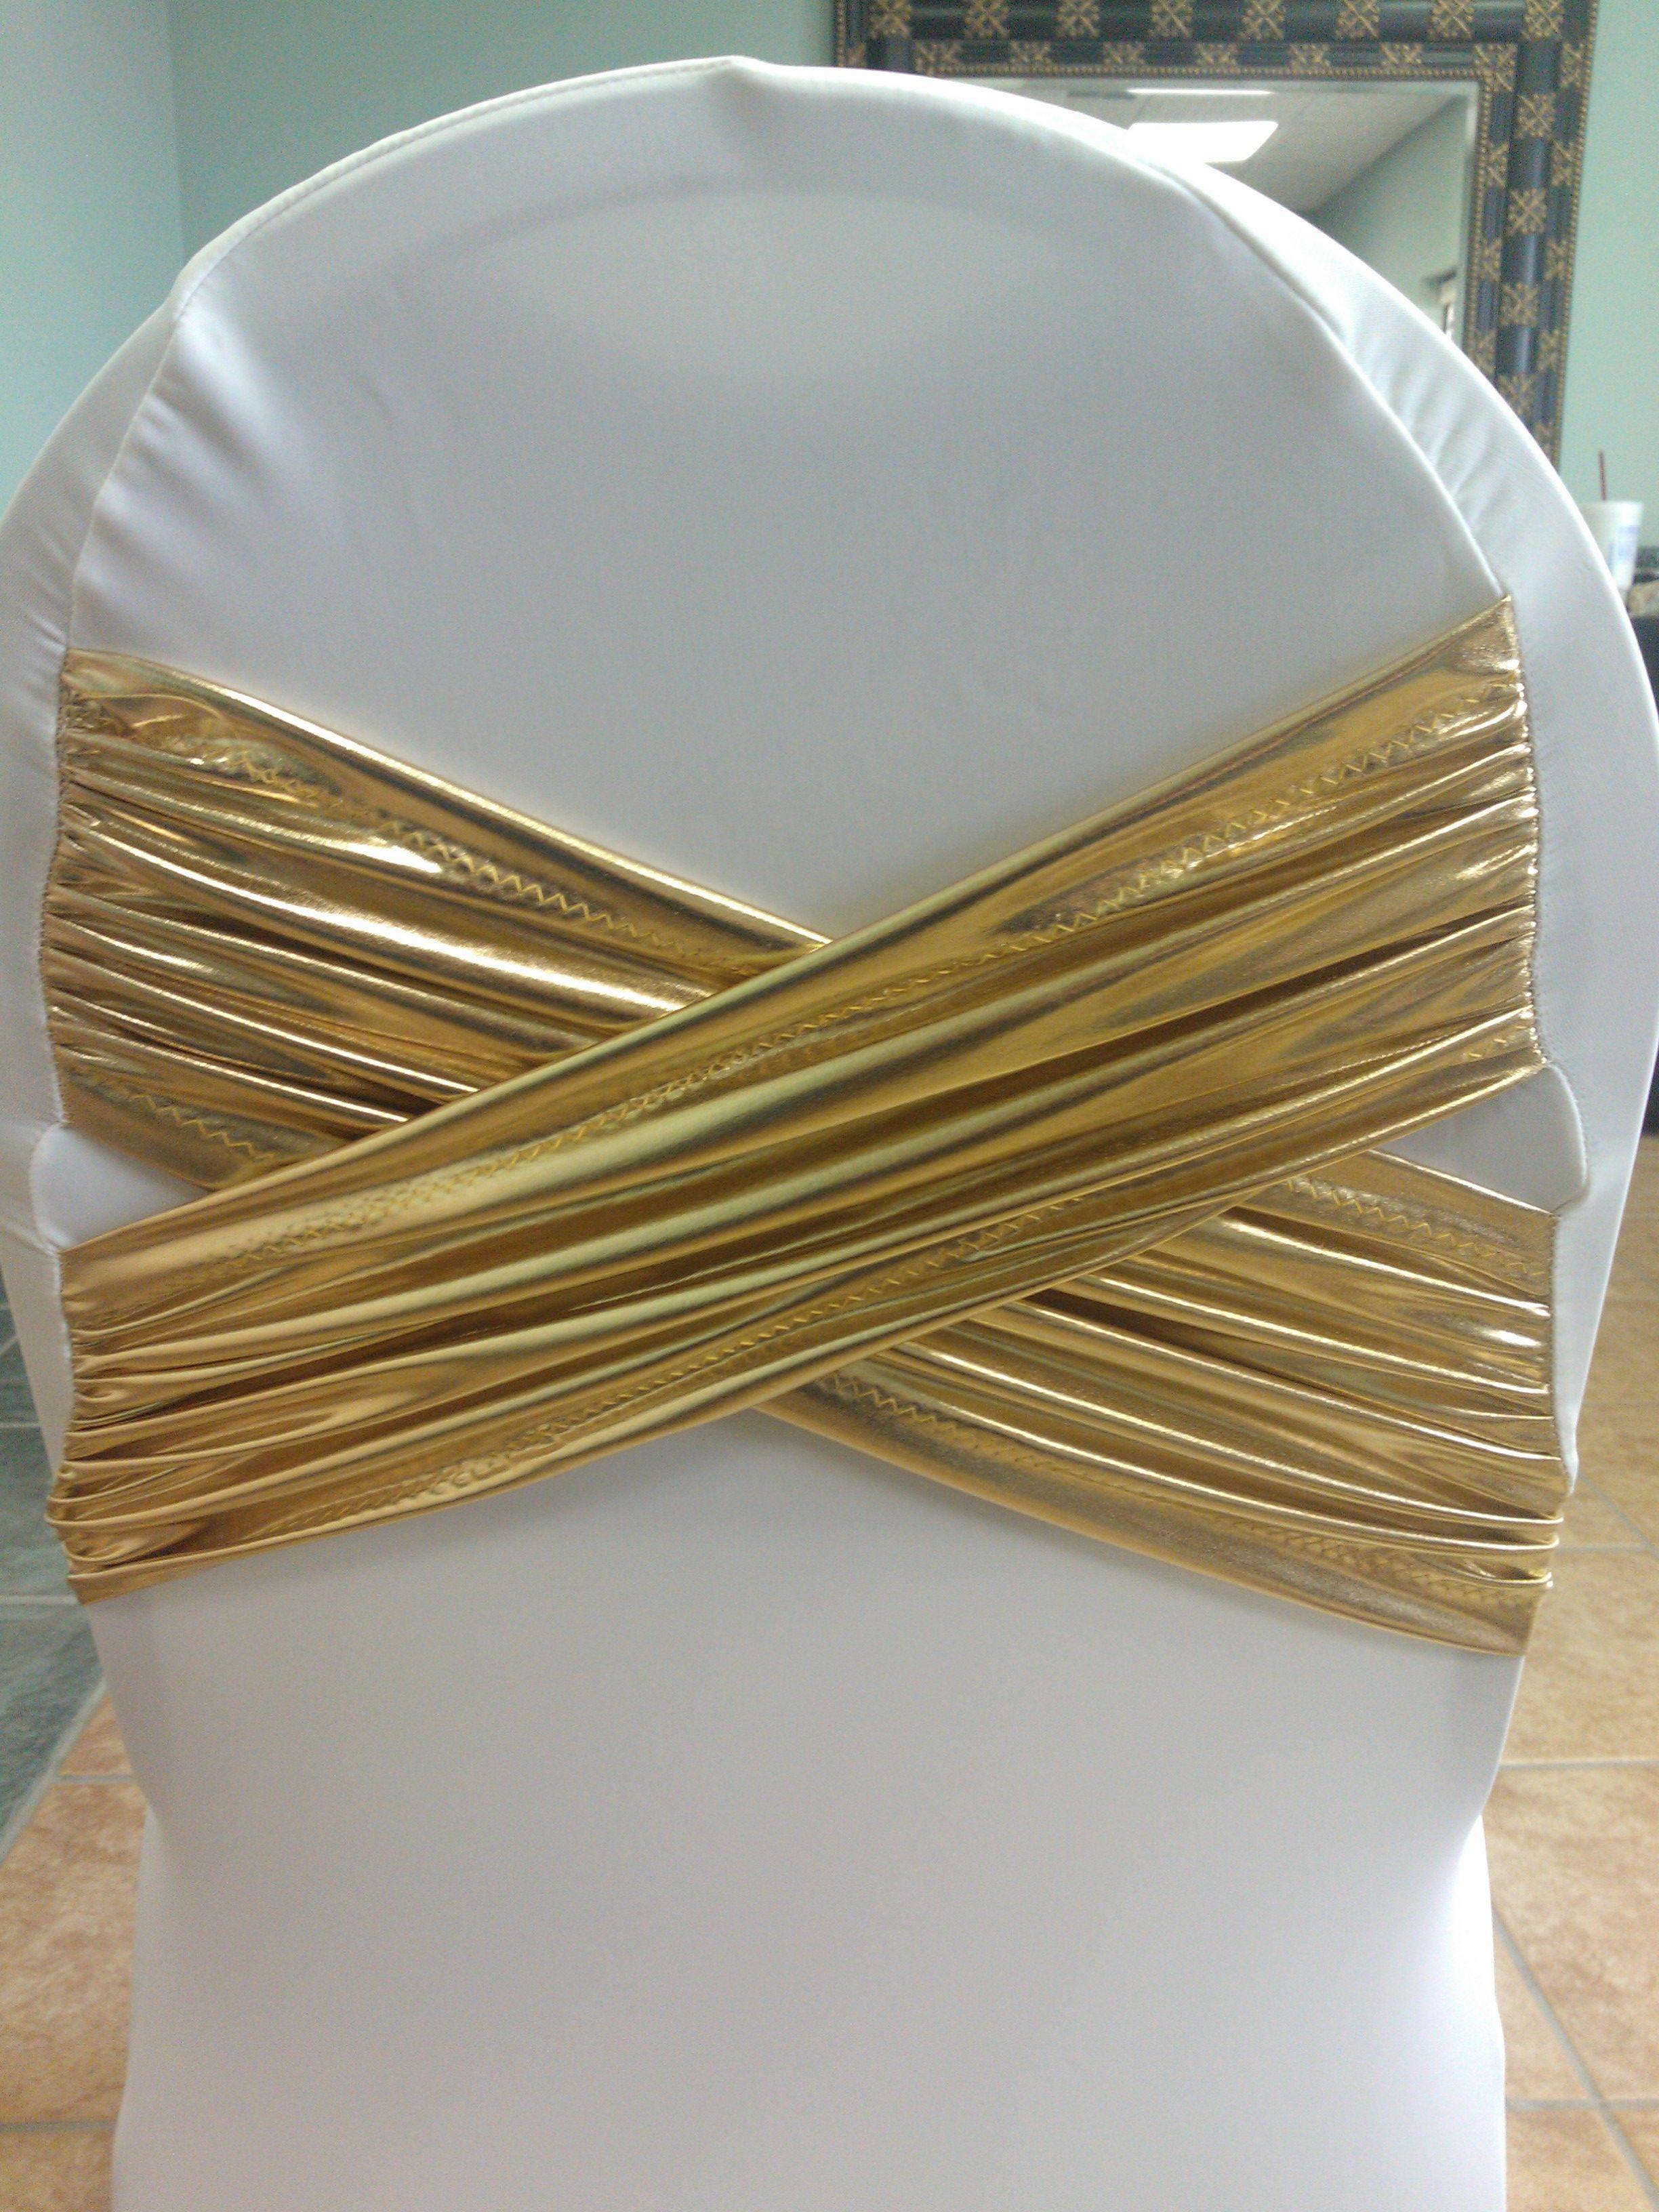 Diamond X white spandex chair cover with gold metallic